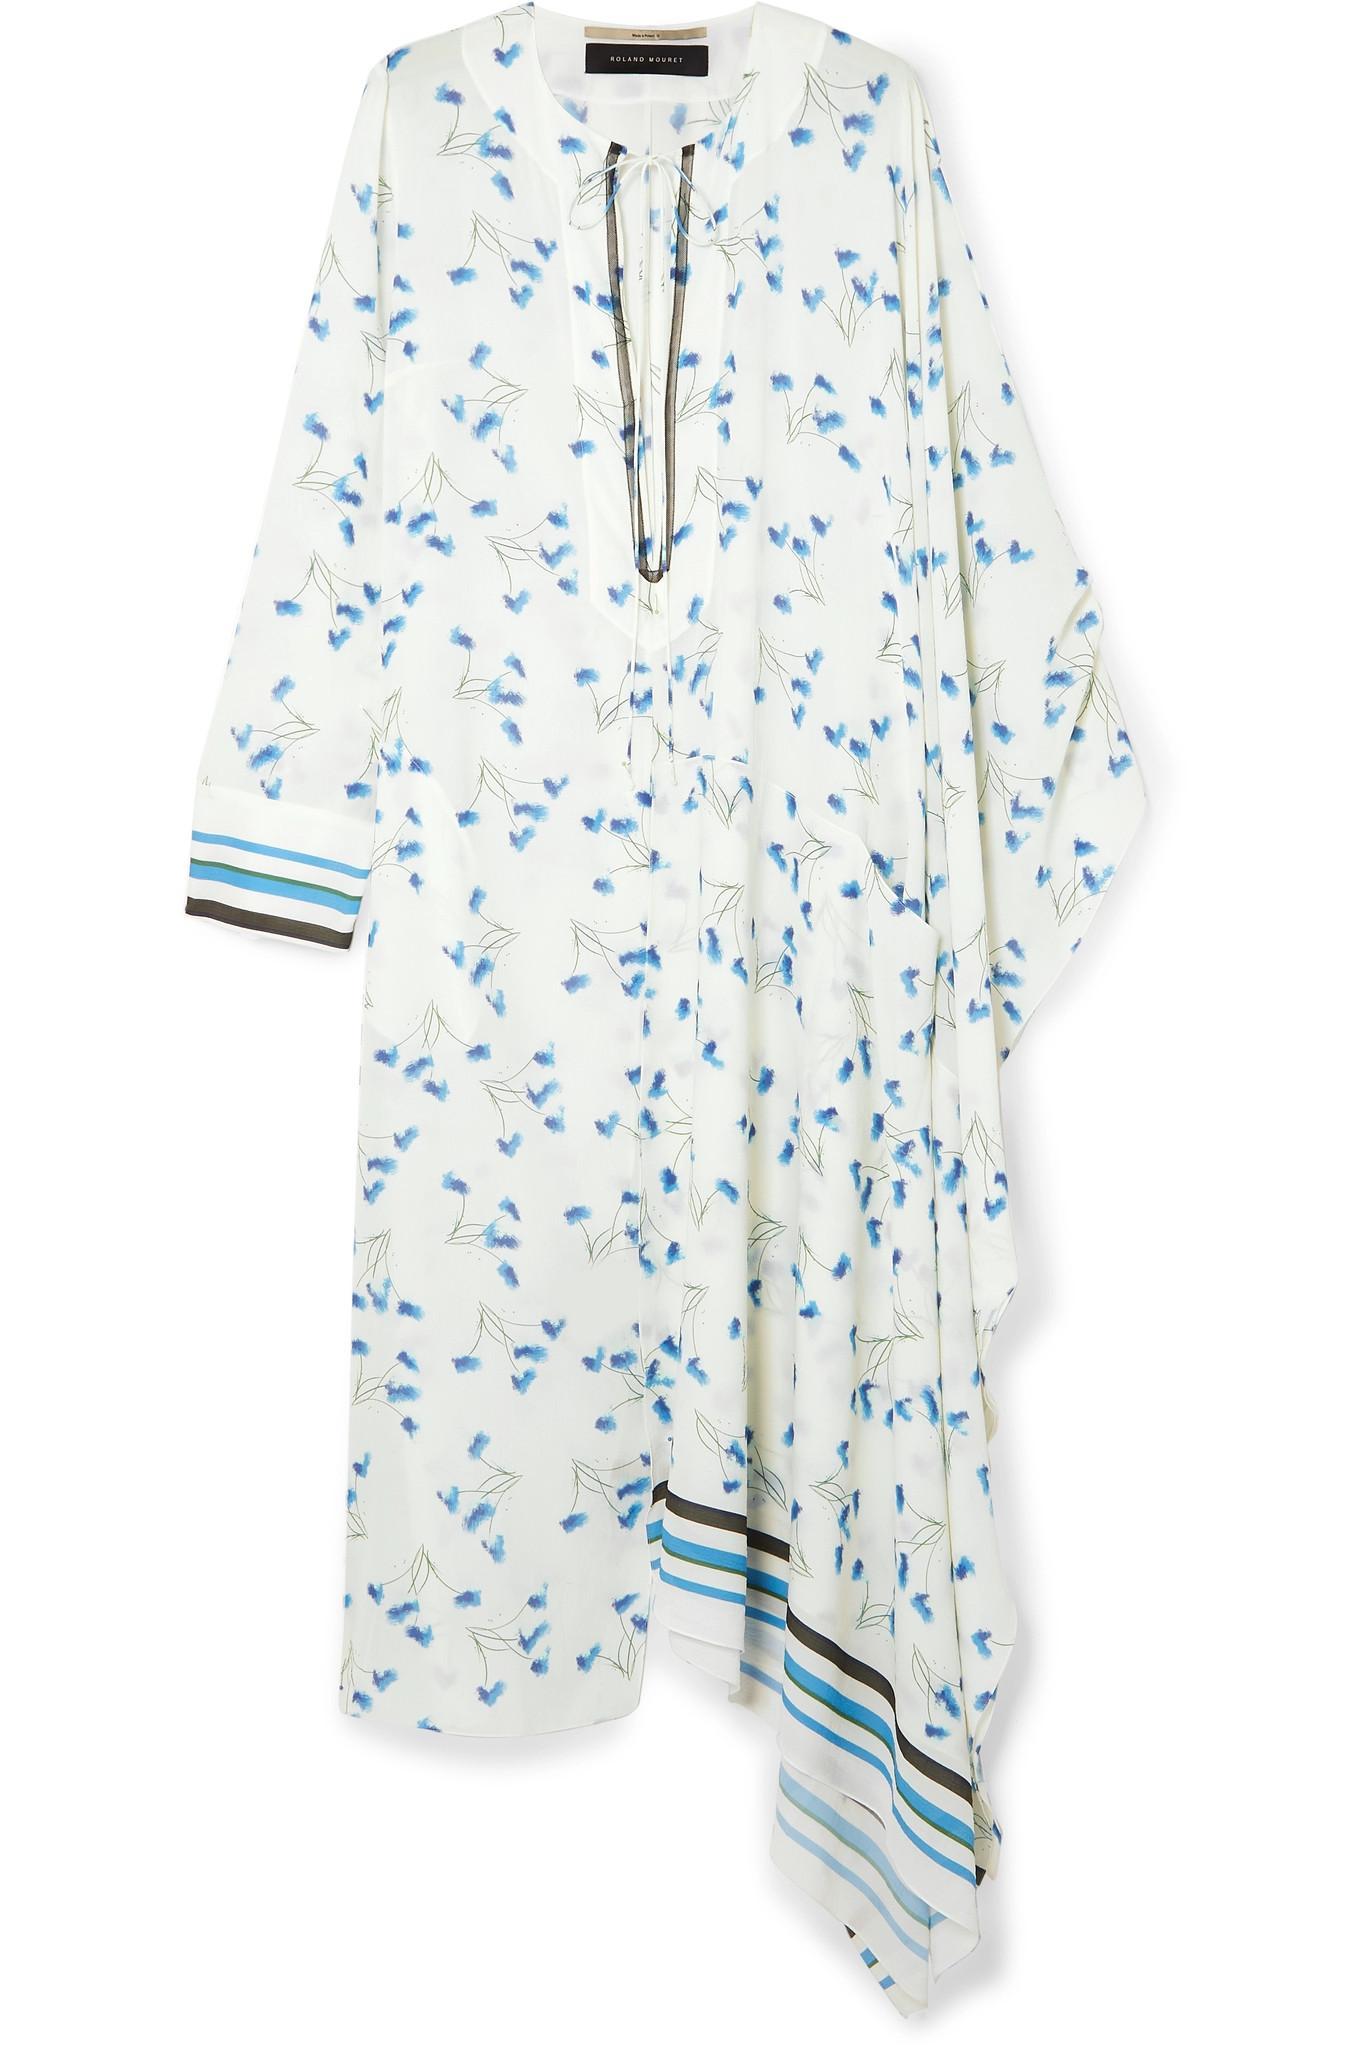 2f0dfa9b90 Lyst - Roland Mouret Damon Mesh-trimmed Printed Crepe Dress in Blue